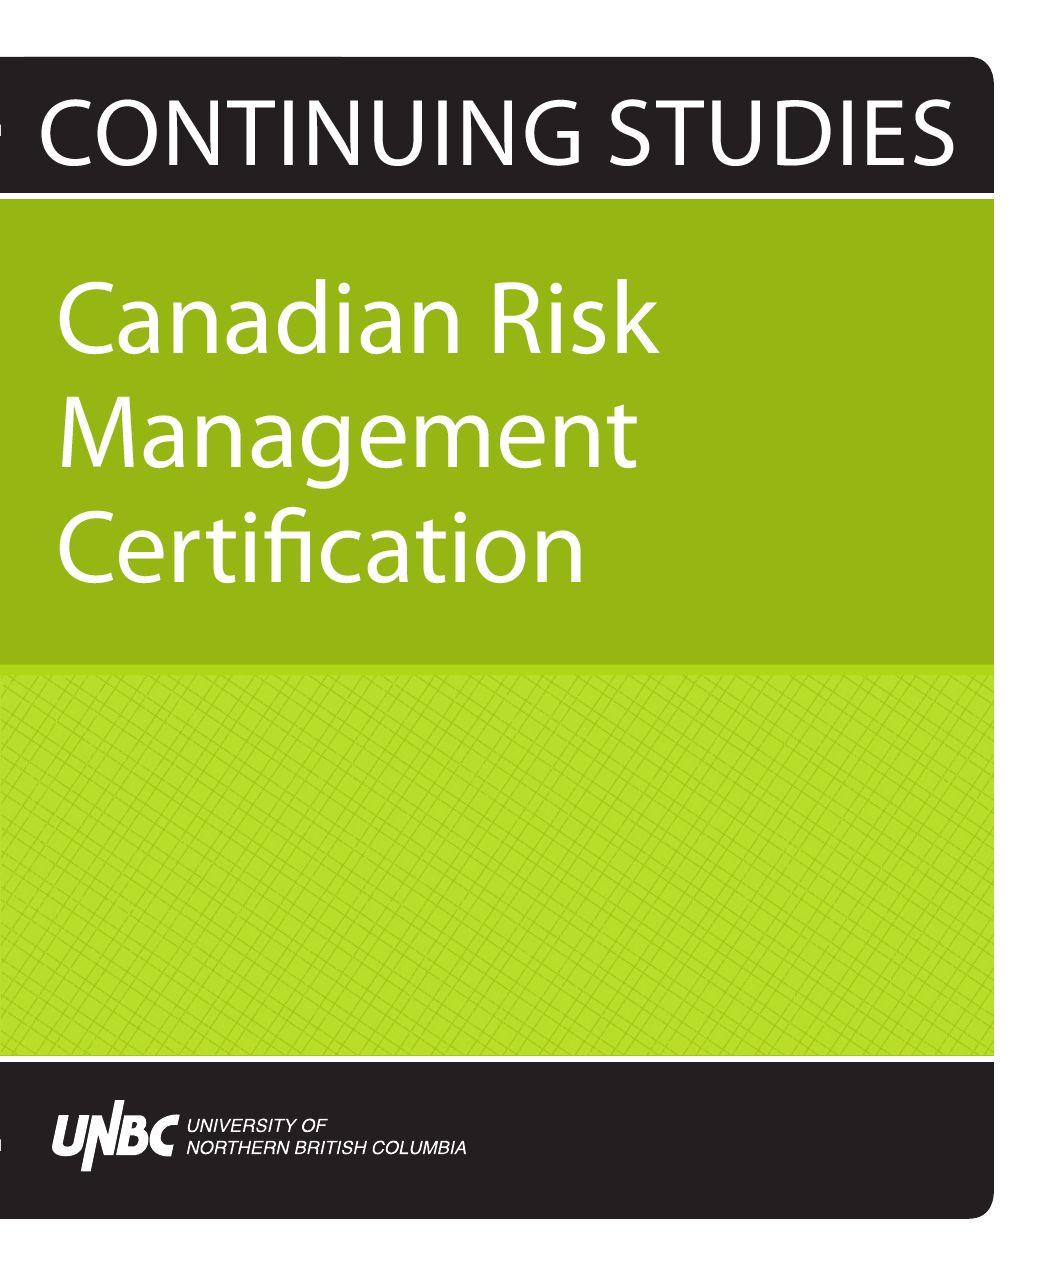 Canadian Risk Management Certification By Unbc Continuing Studies